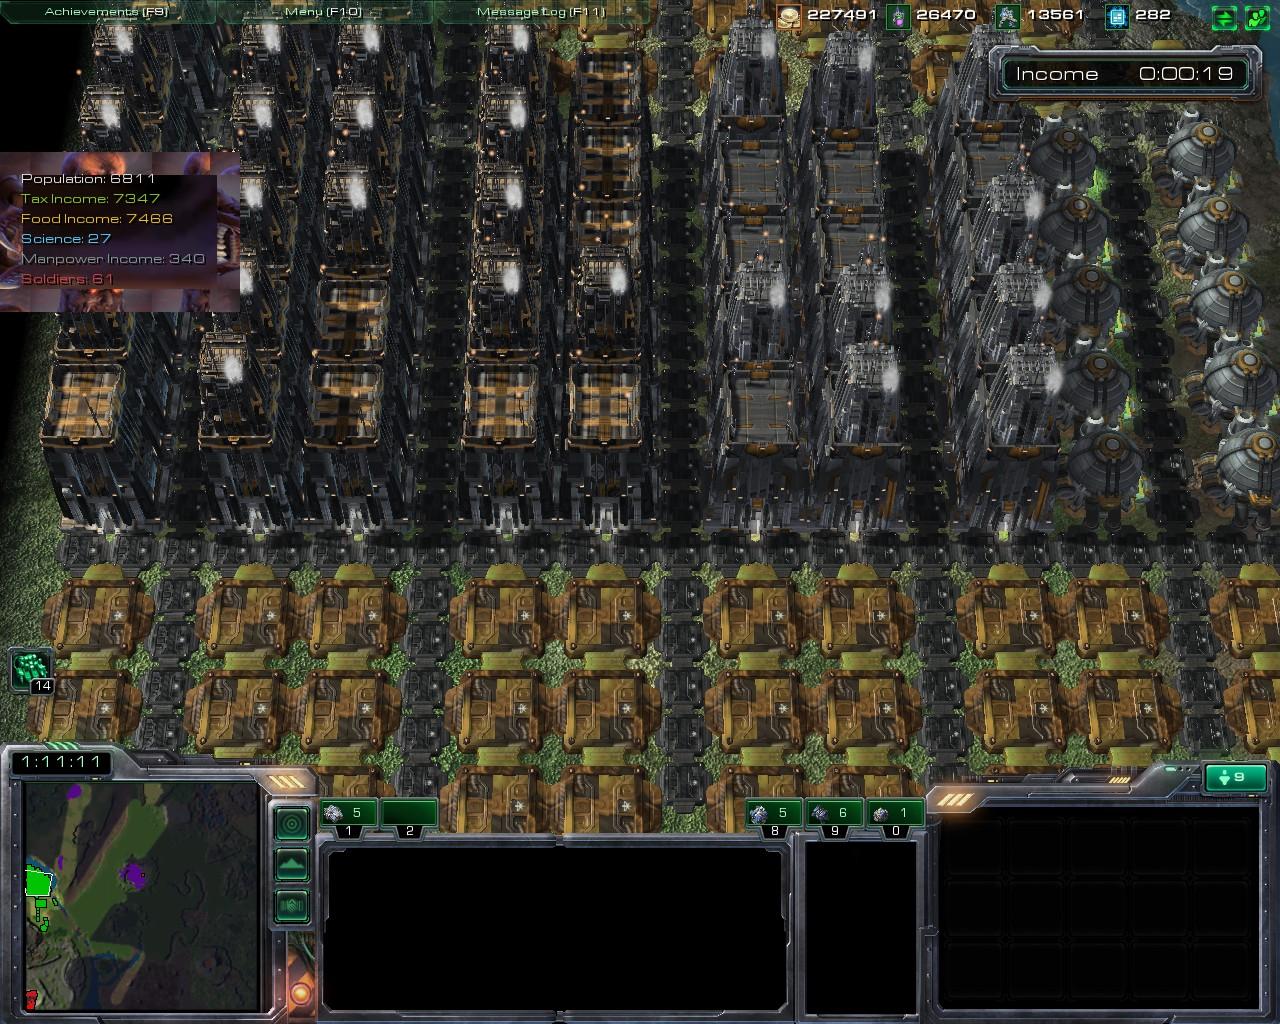 empire builder game download